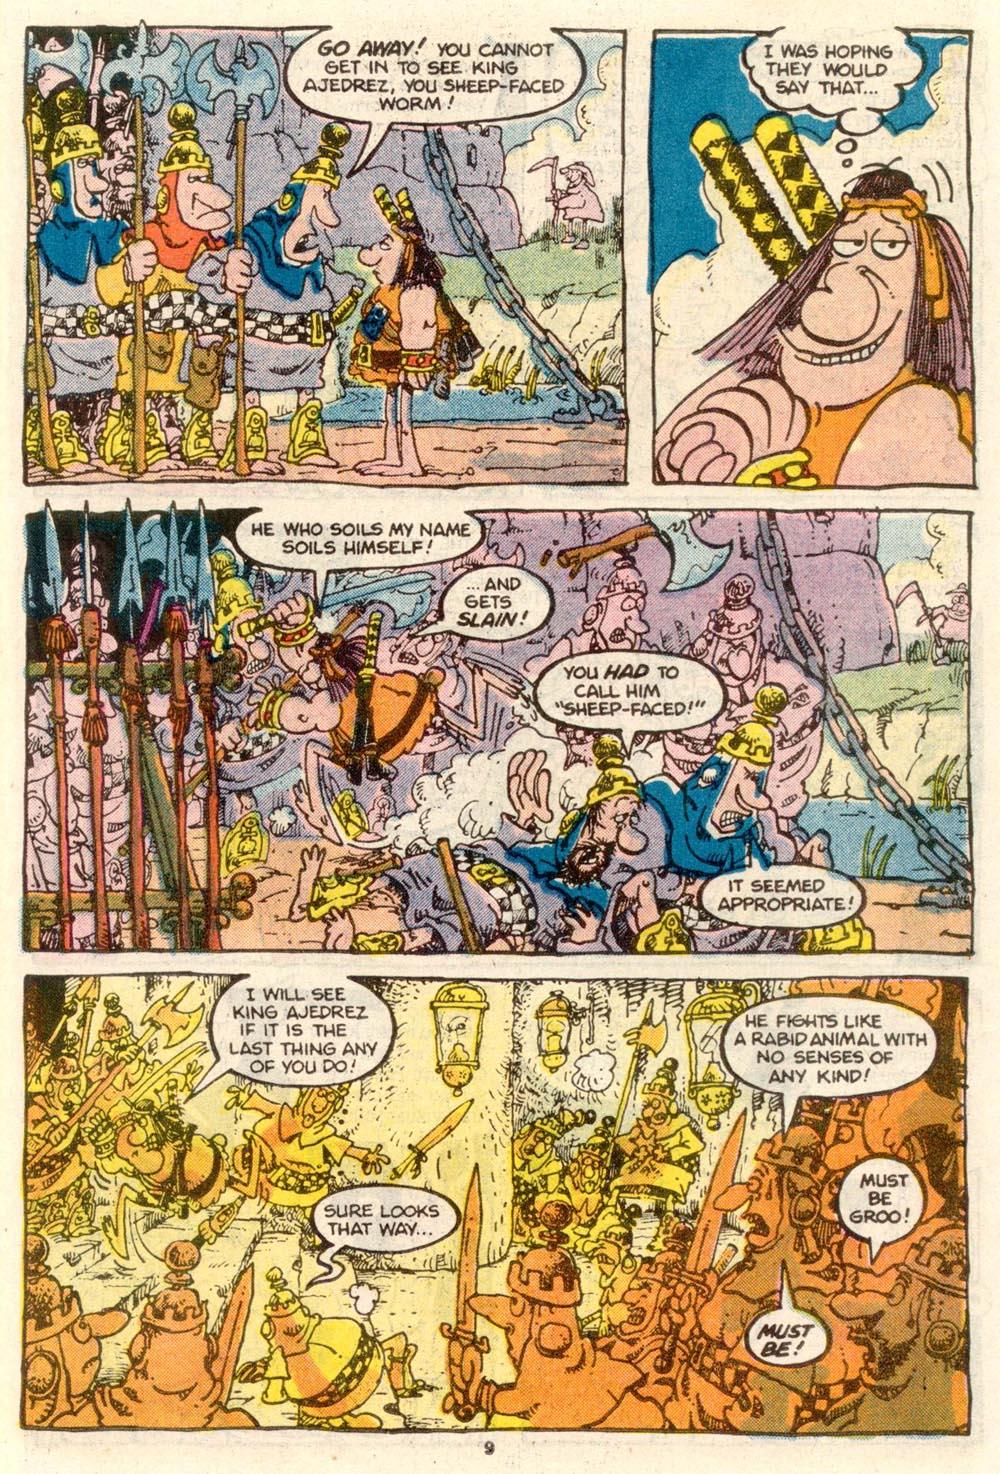 Read online Sergio Aragonés Groo the Wanderer comic -  Issue #24 - 10